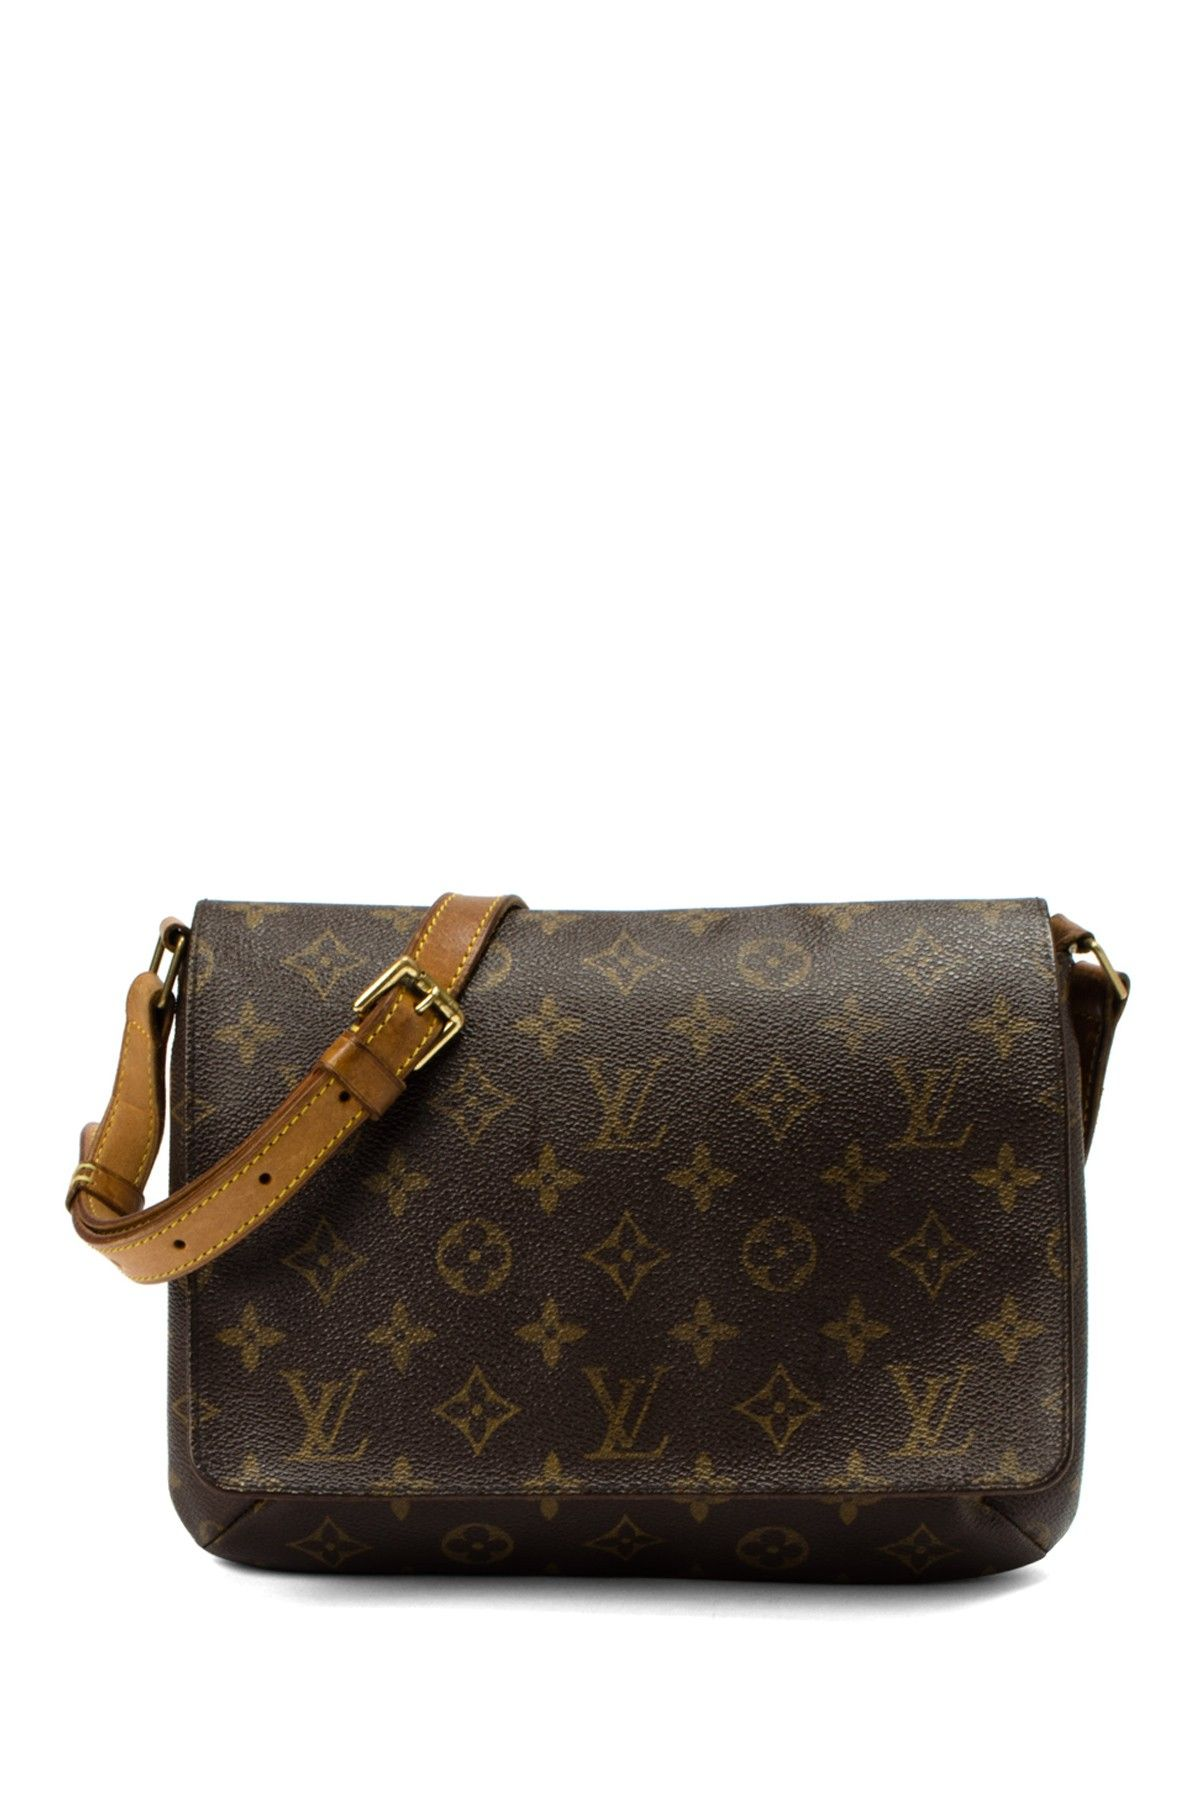 Nuetral crossbody - Vintage Louis Vuitton Leather Musette Tango Short Crossbody